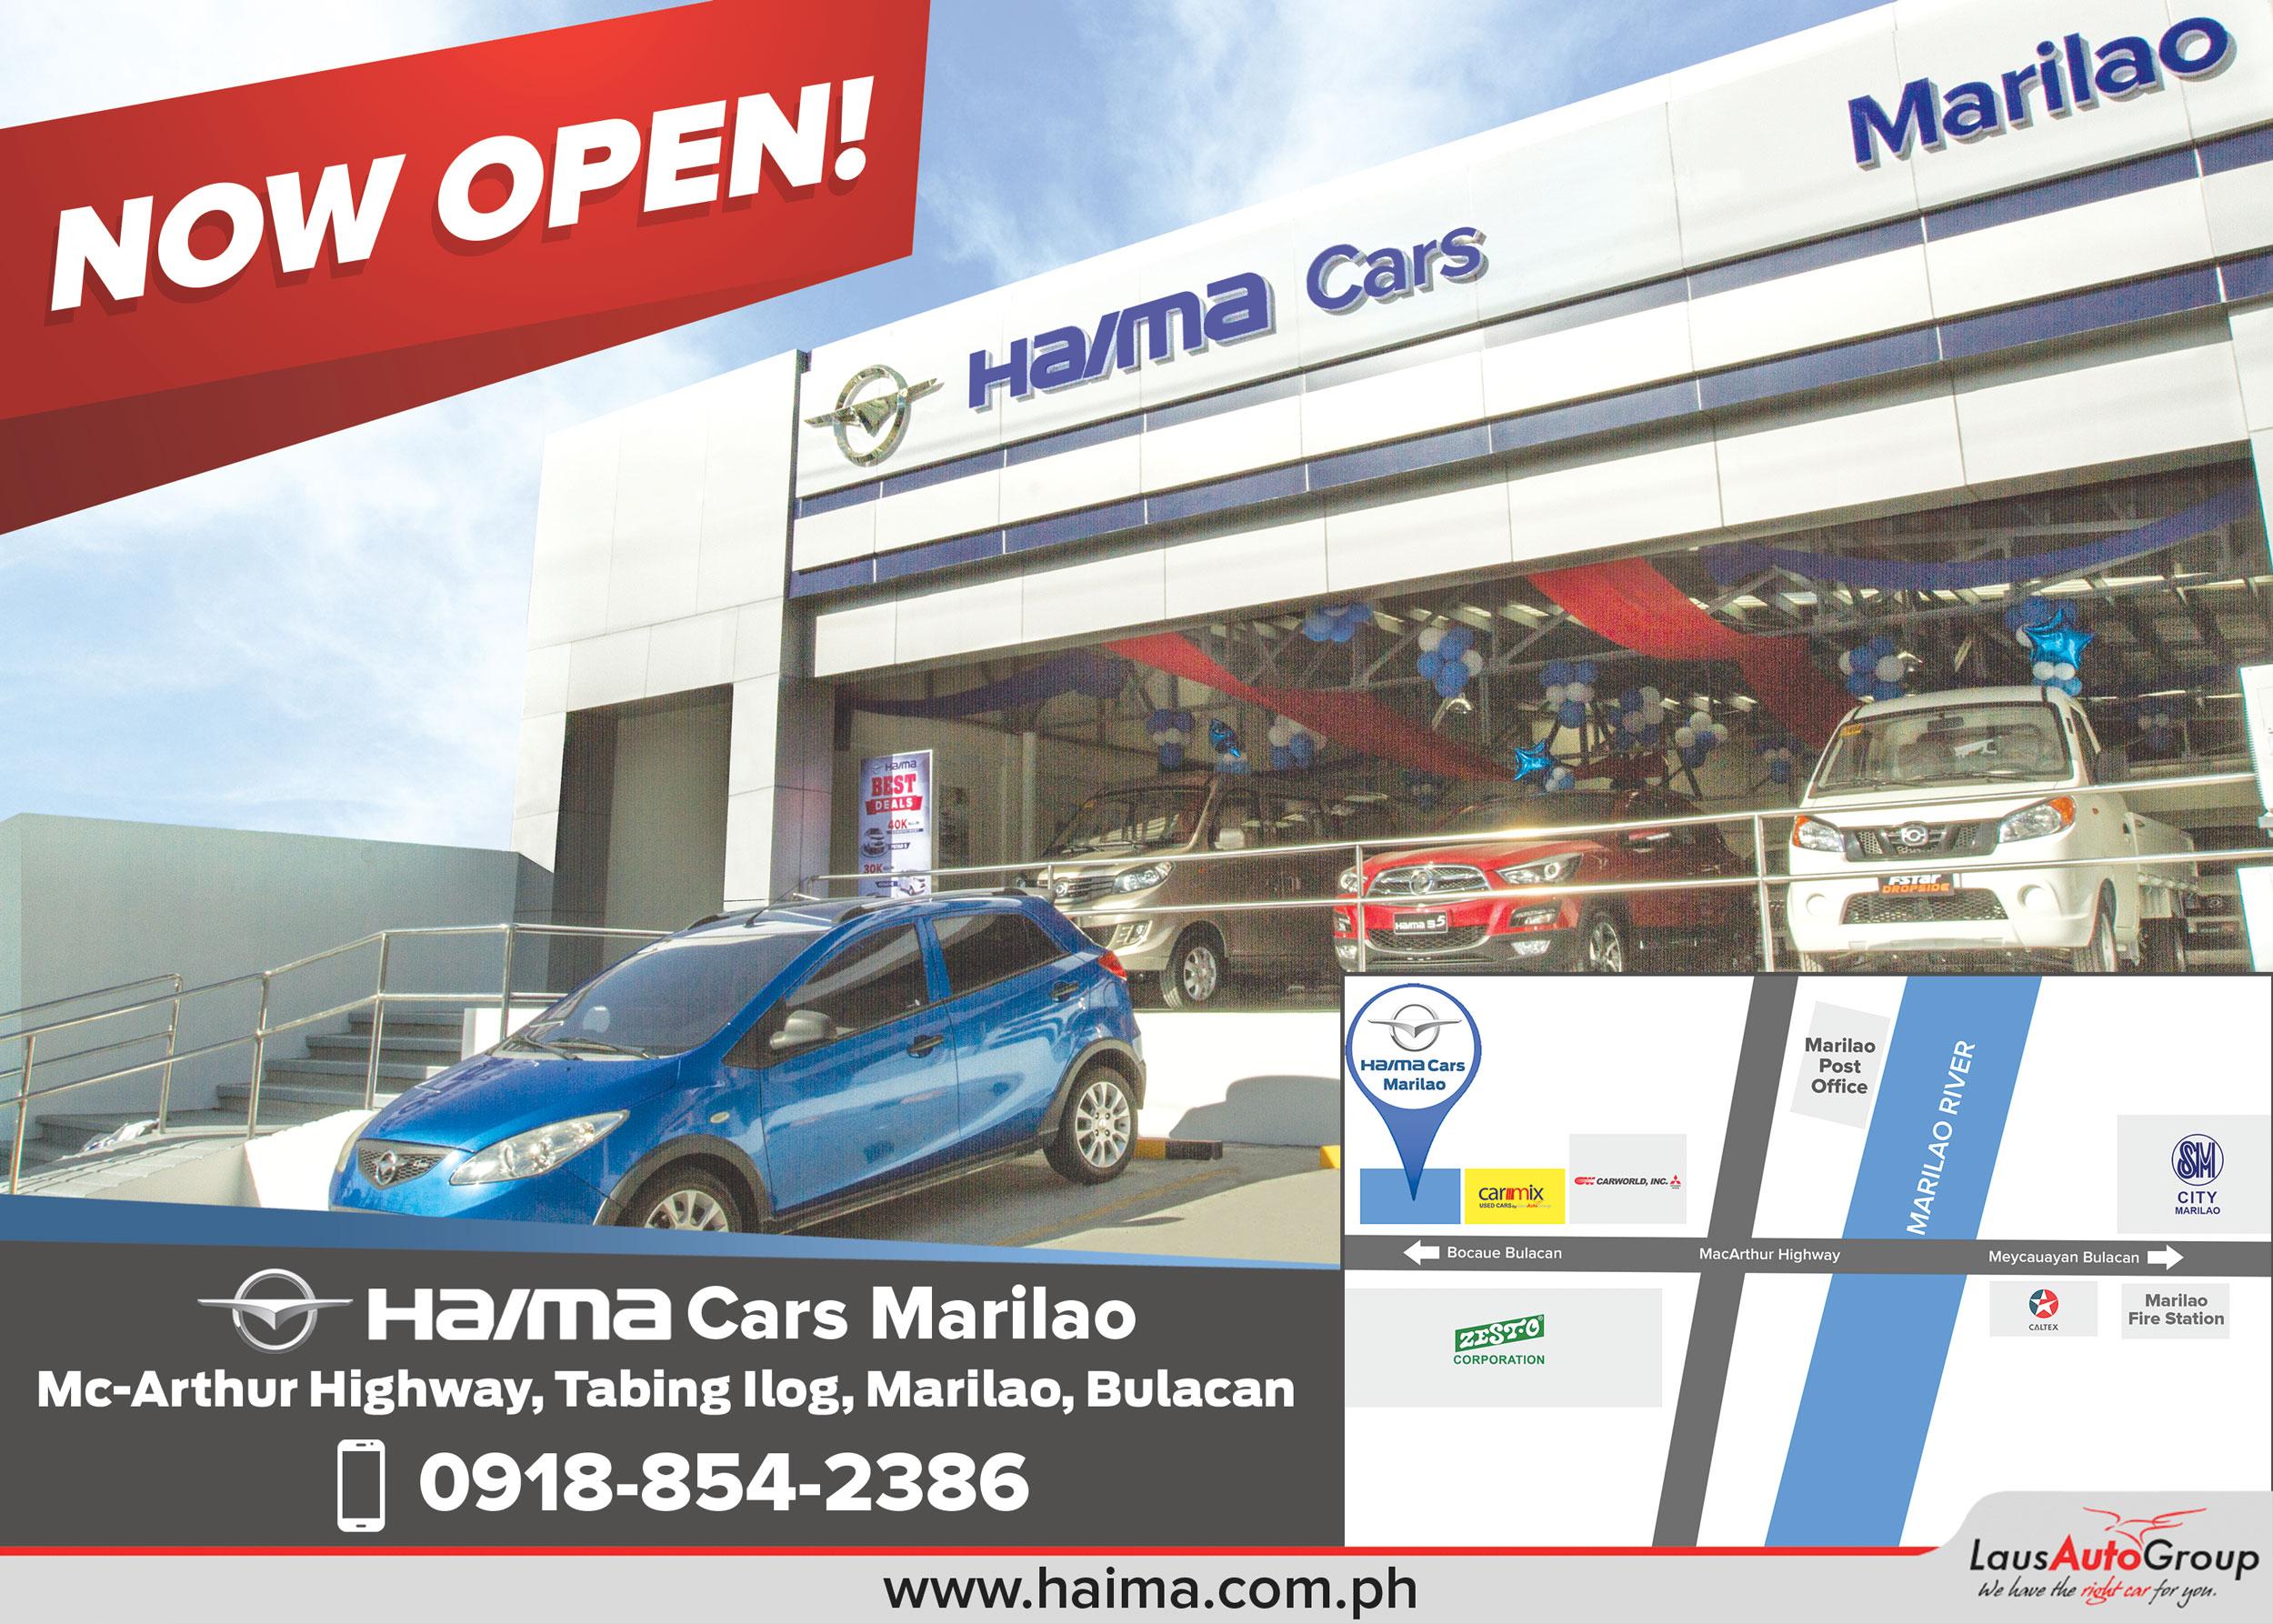 Haima Marilao Now Open